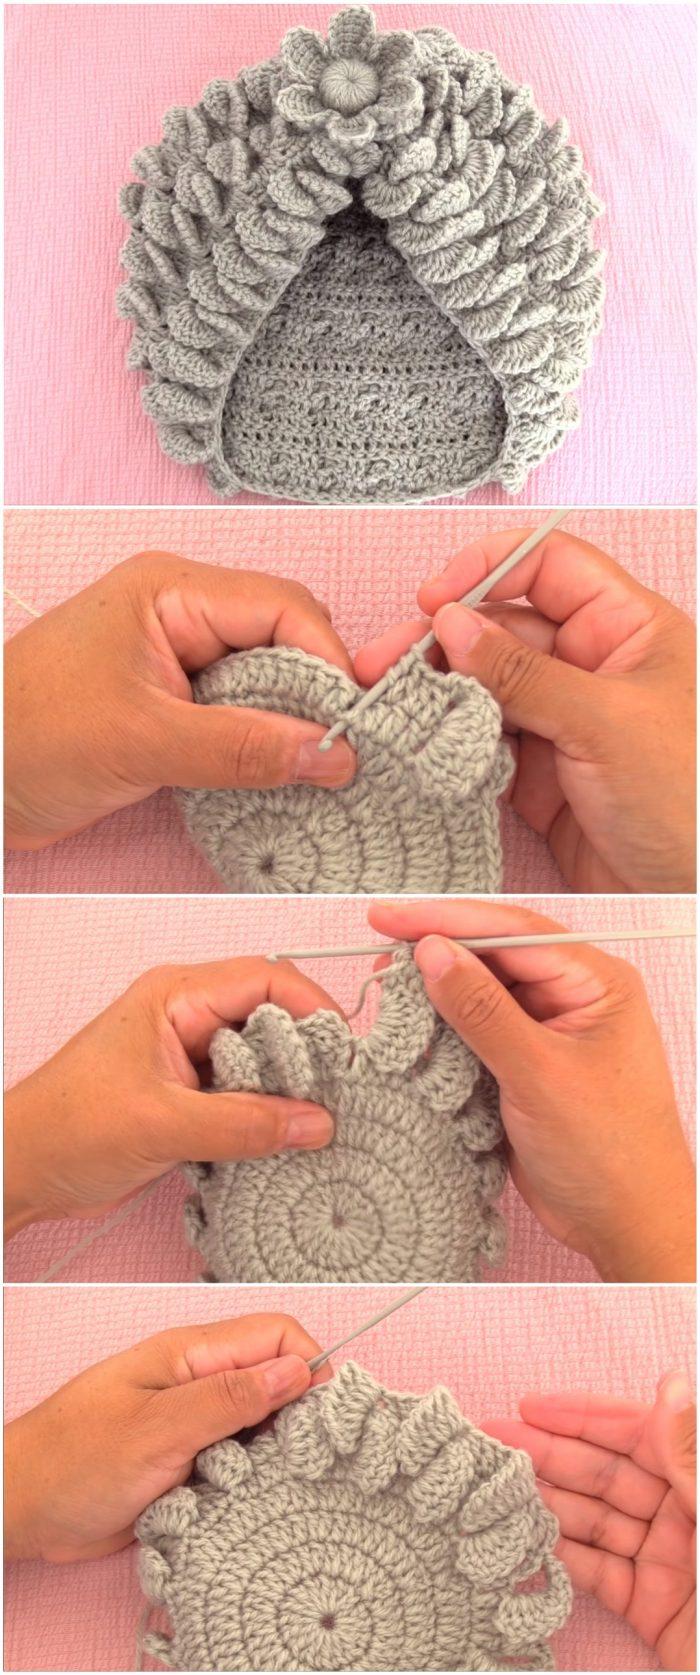 Enjoy your crocheting time and please de1c5d4e863